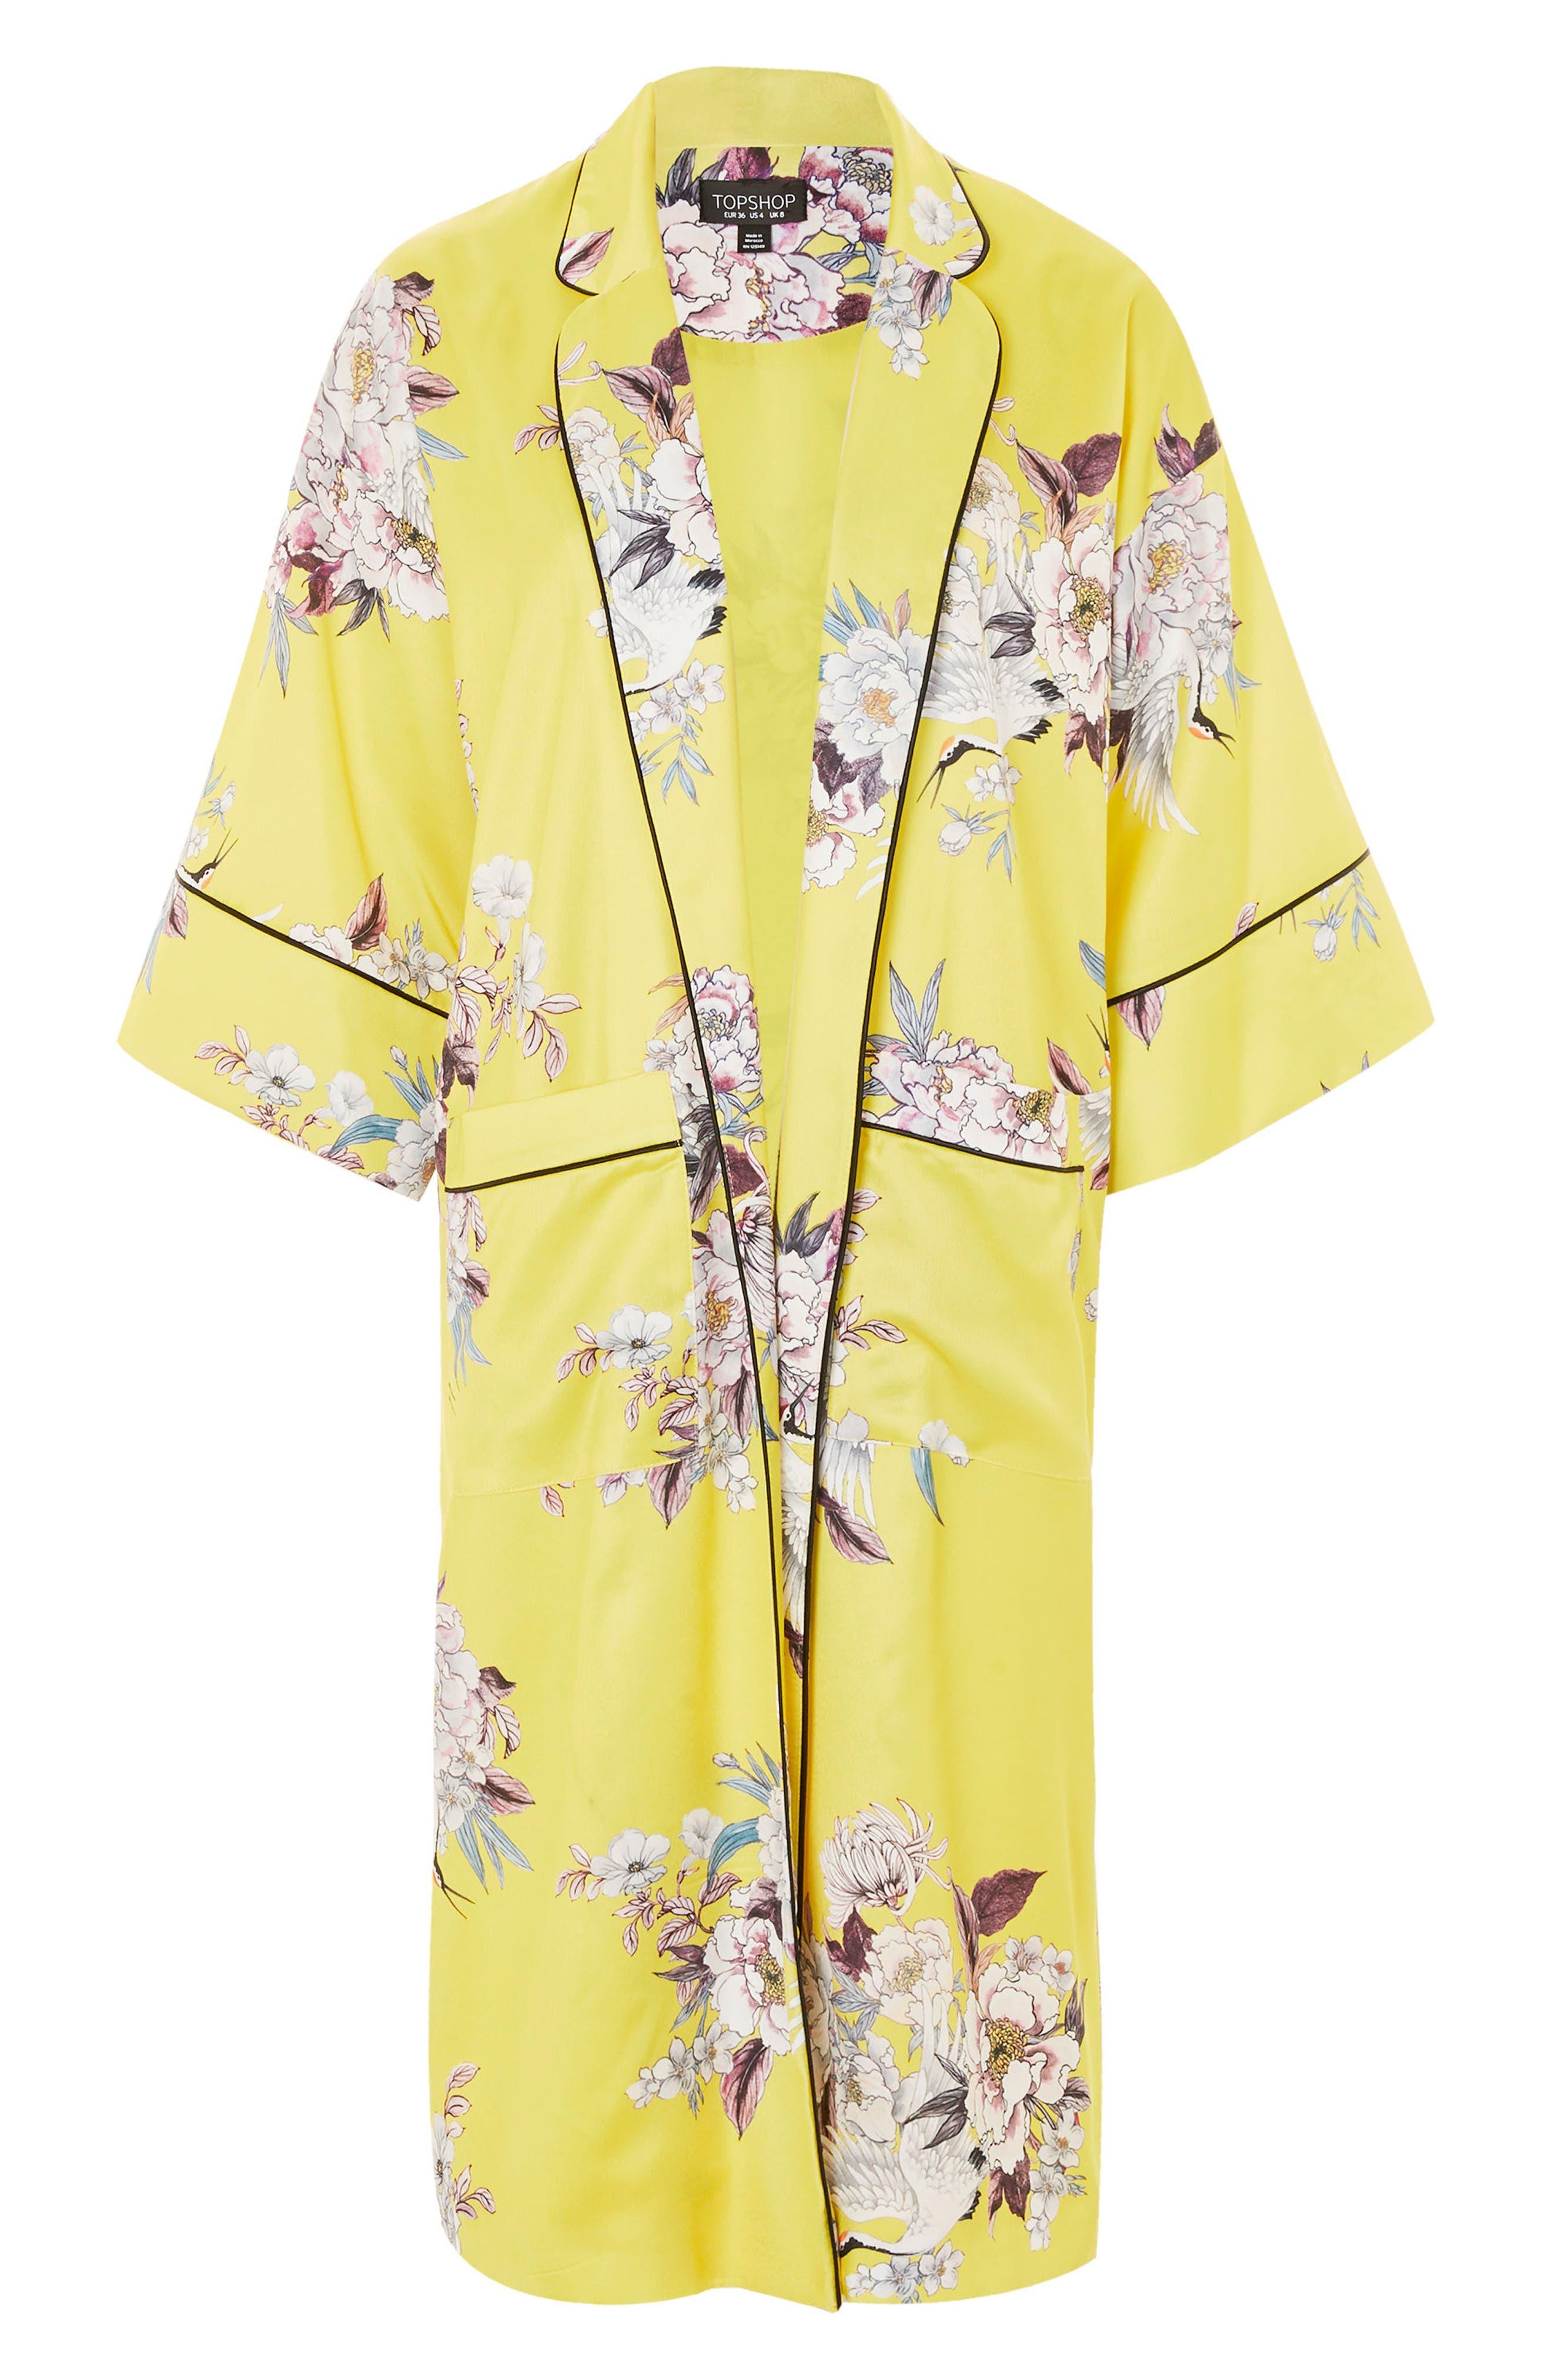 Heron Print Kimono,                             Alternate thumbnail 4, color,                             Yellow Multi